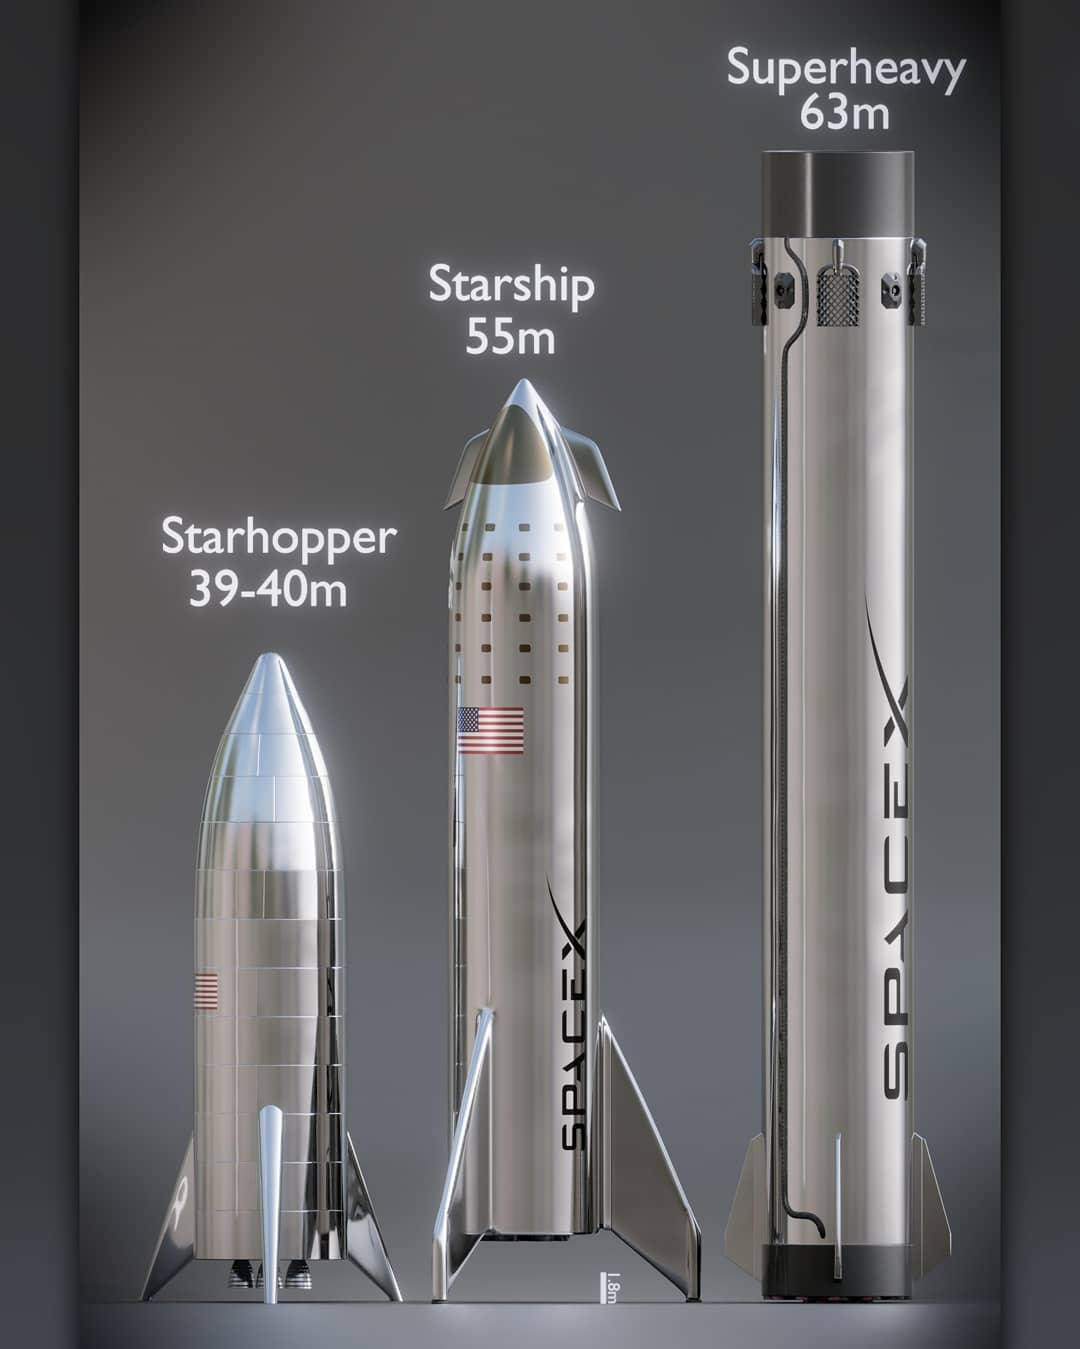 SpaceX%2BStarhopper%252C%2BStarship%2Band%2BSuper%2BHeavy%2Bmodel%2Bcomparison%2Bwith%2Bheight%2Bby%2BKimi%2BTalvitie.jpg